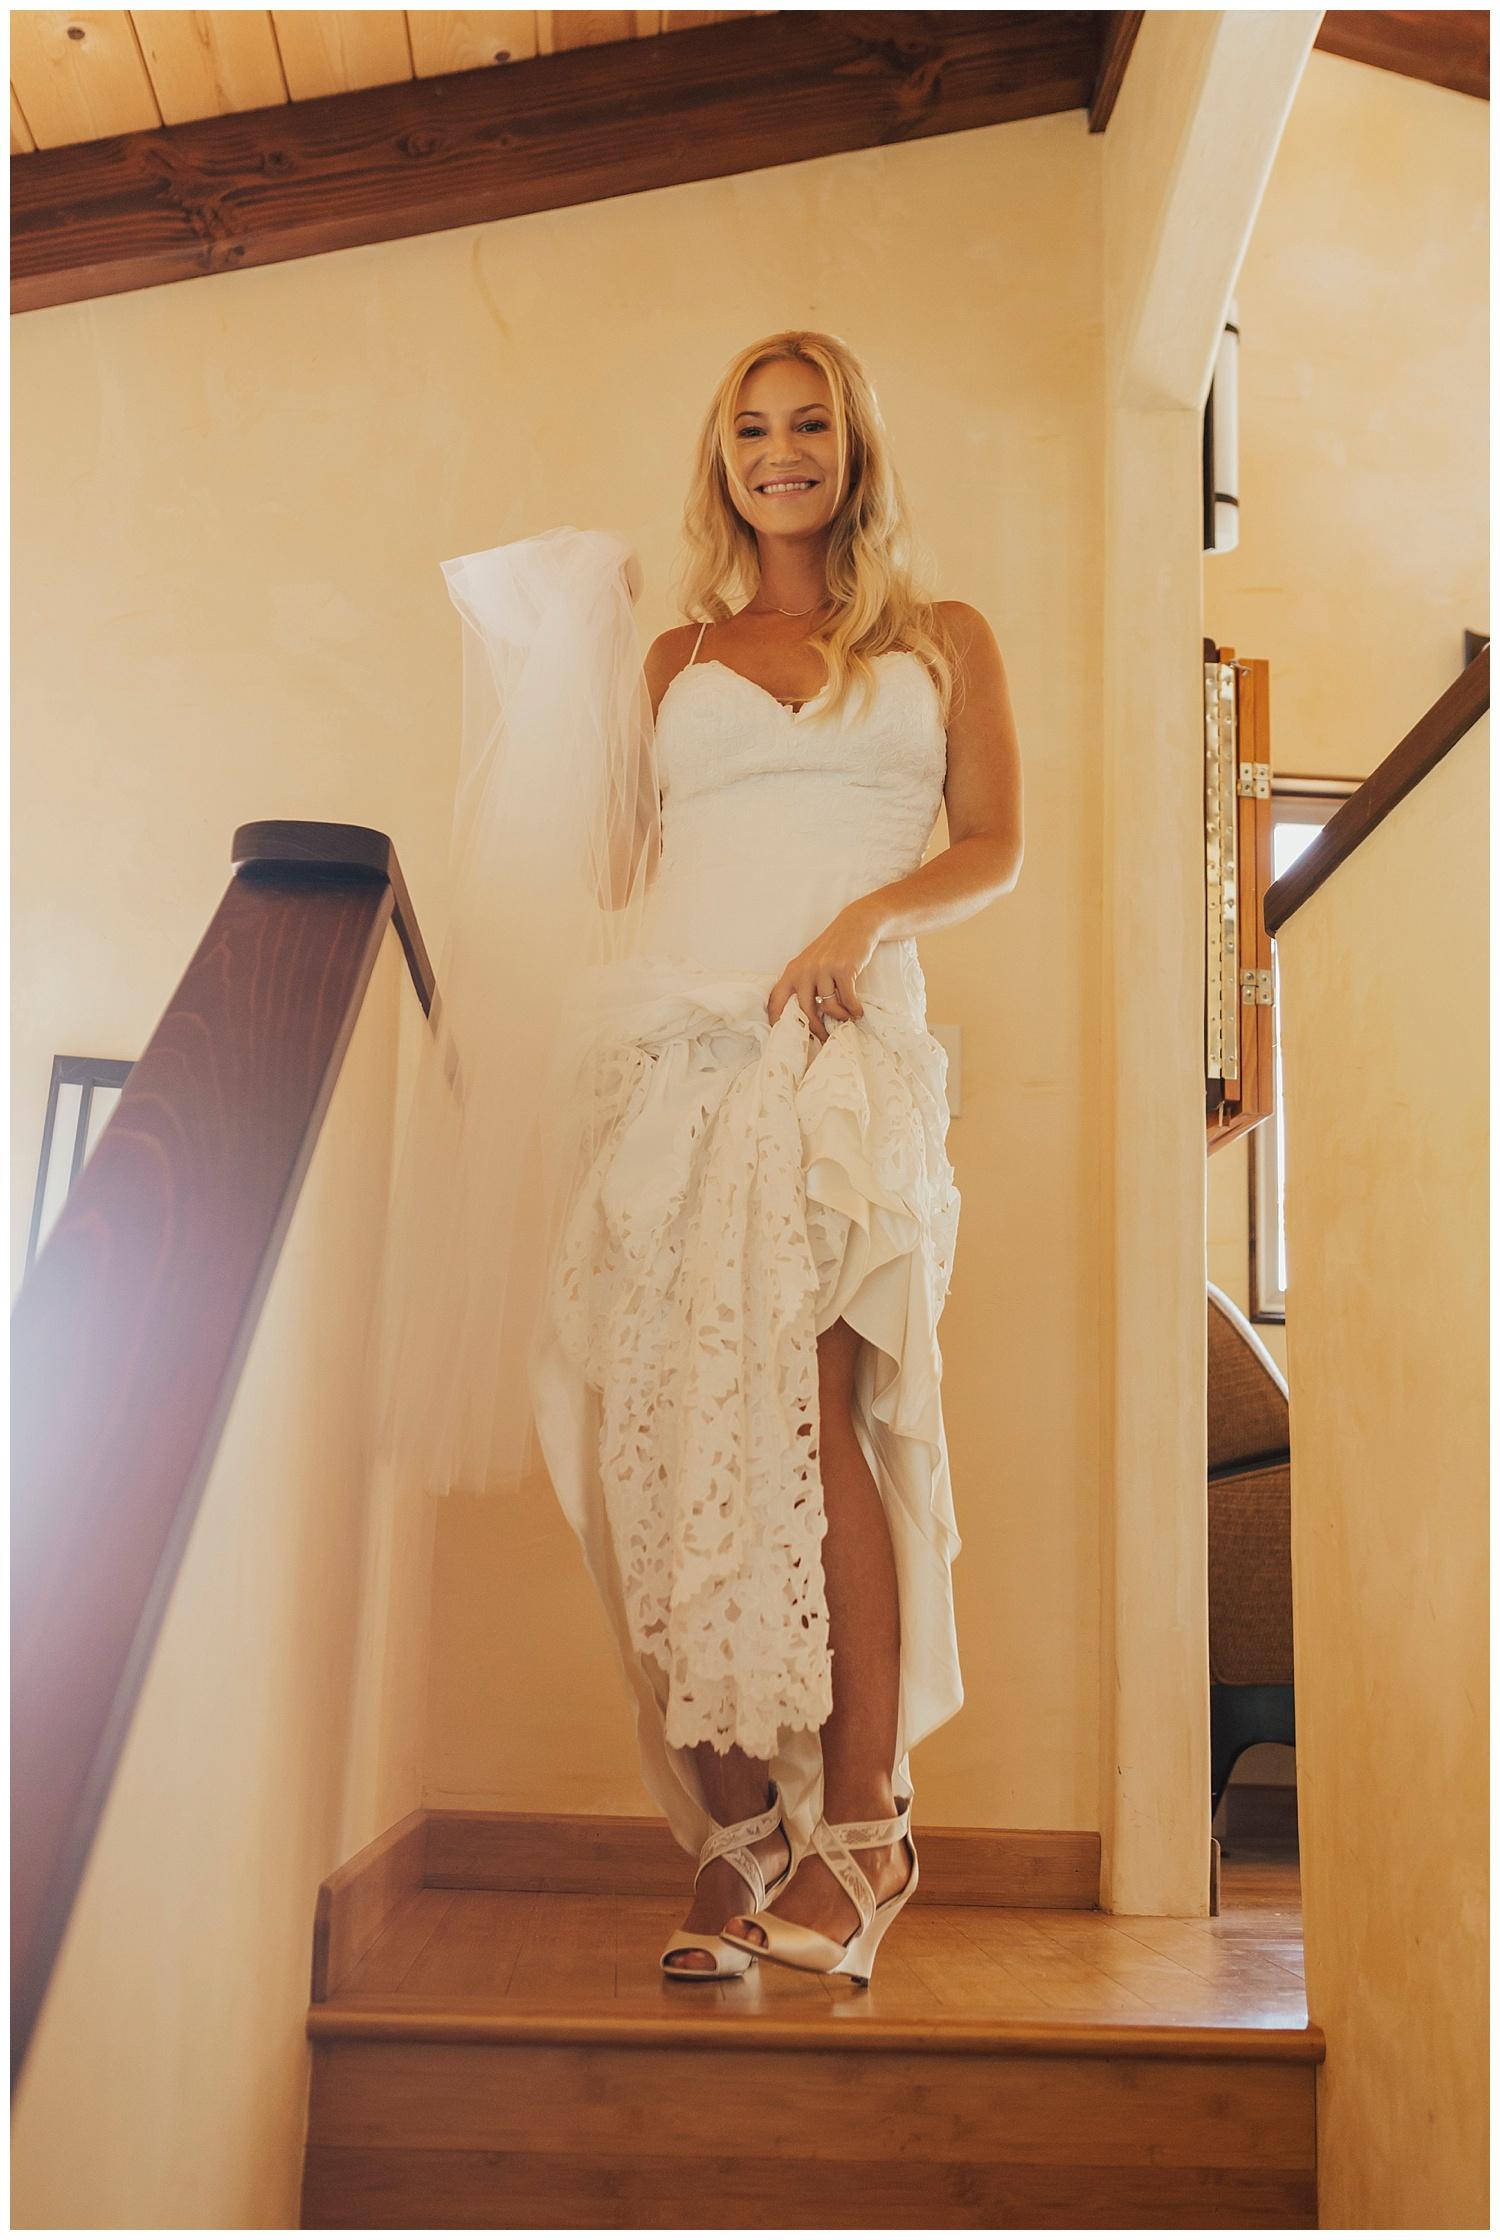 big-sur-wedding-bride-ridley-gown-watters-carol-oliva-photography.jpg